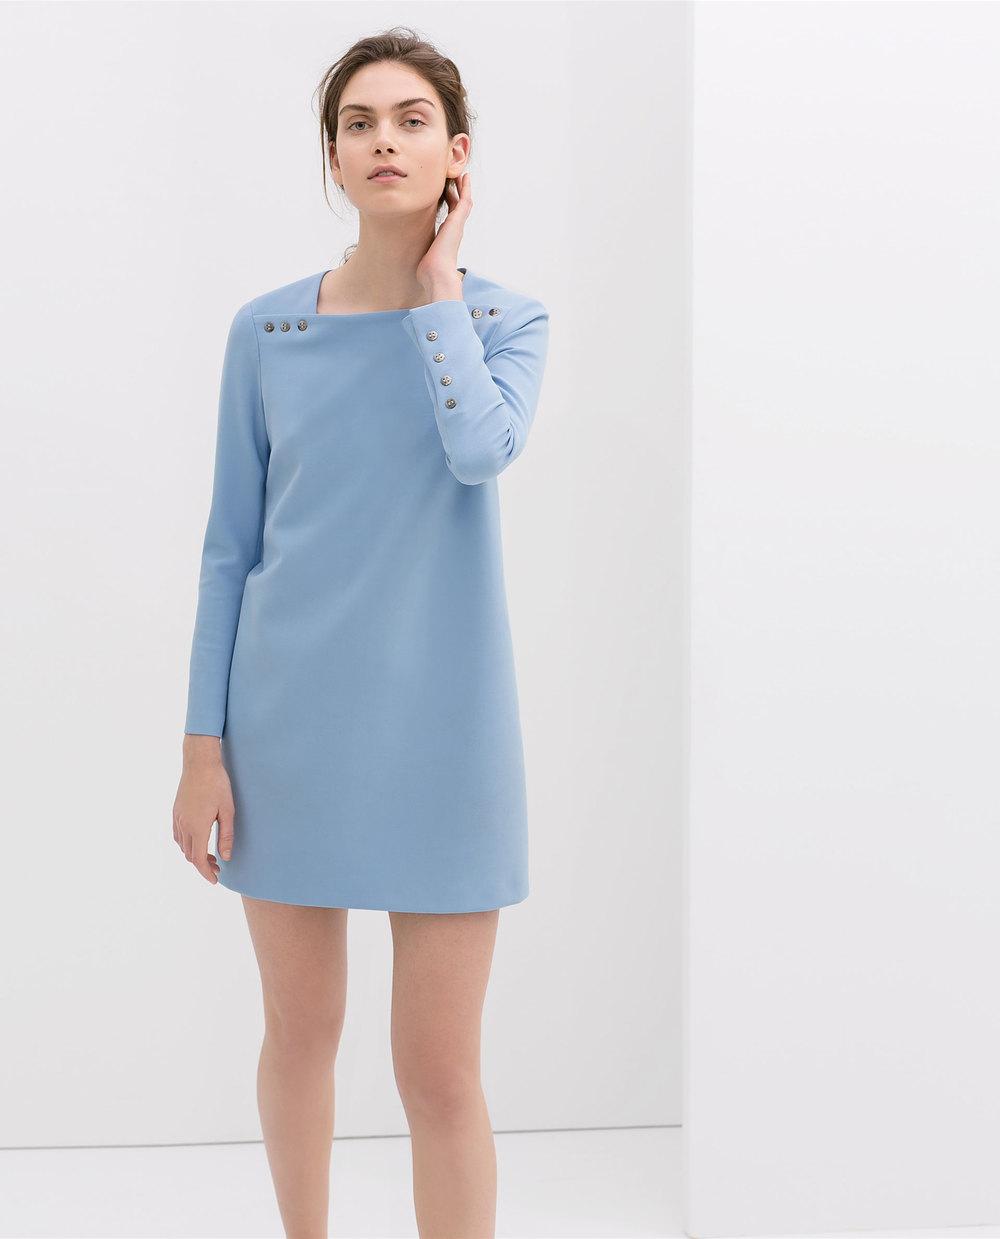 Long sleeve dress with buttons. Zara. $99.90.